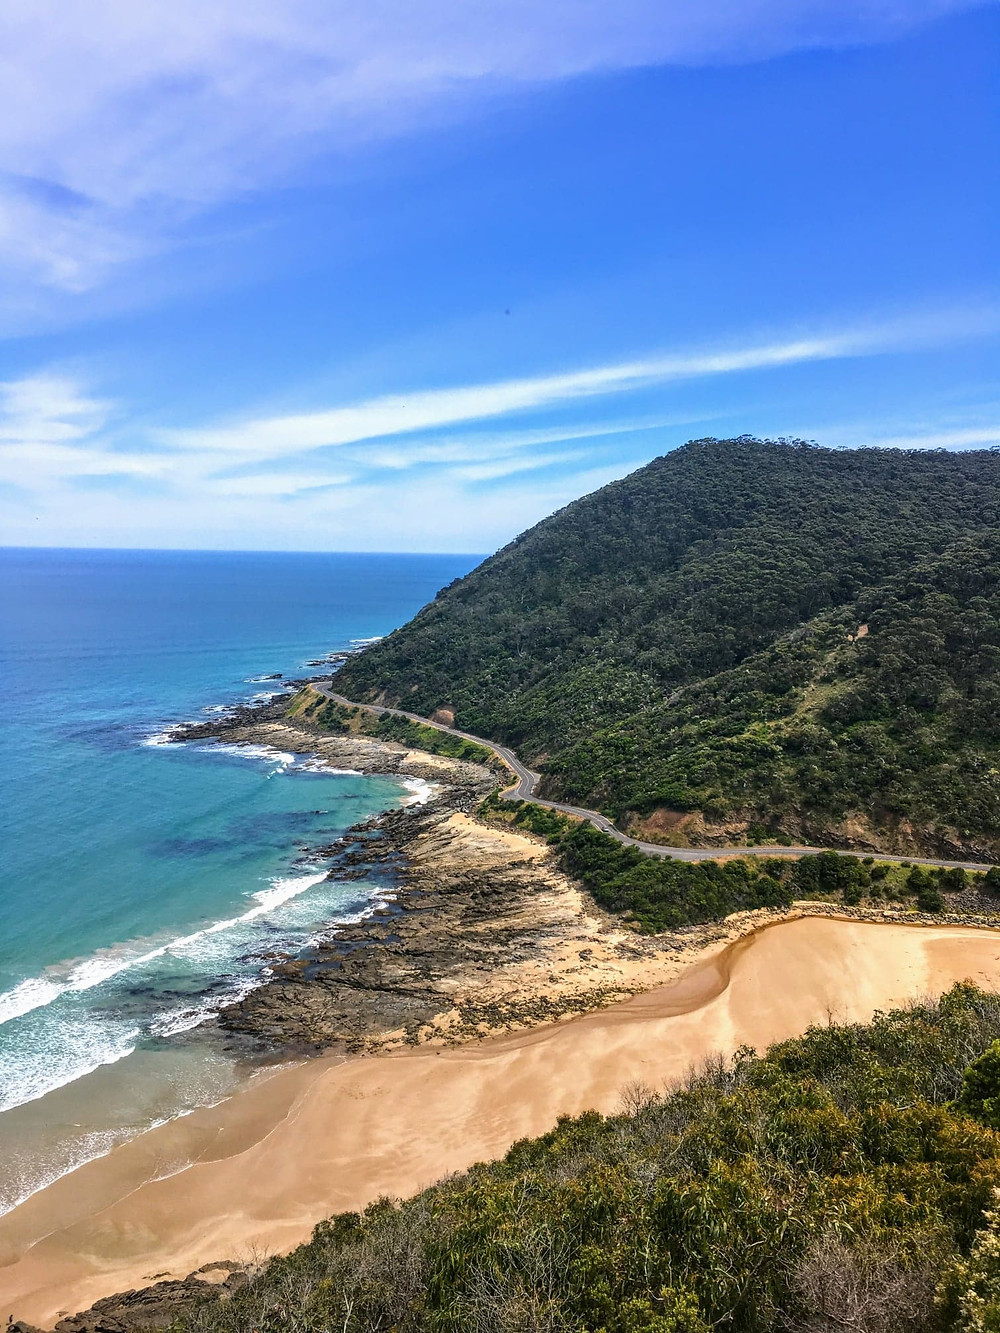 Great Ocean Road on Australian East Coast with ocean view